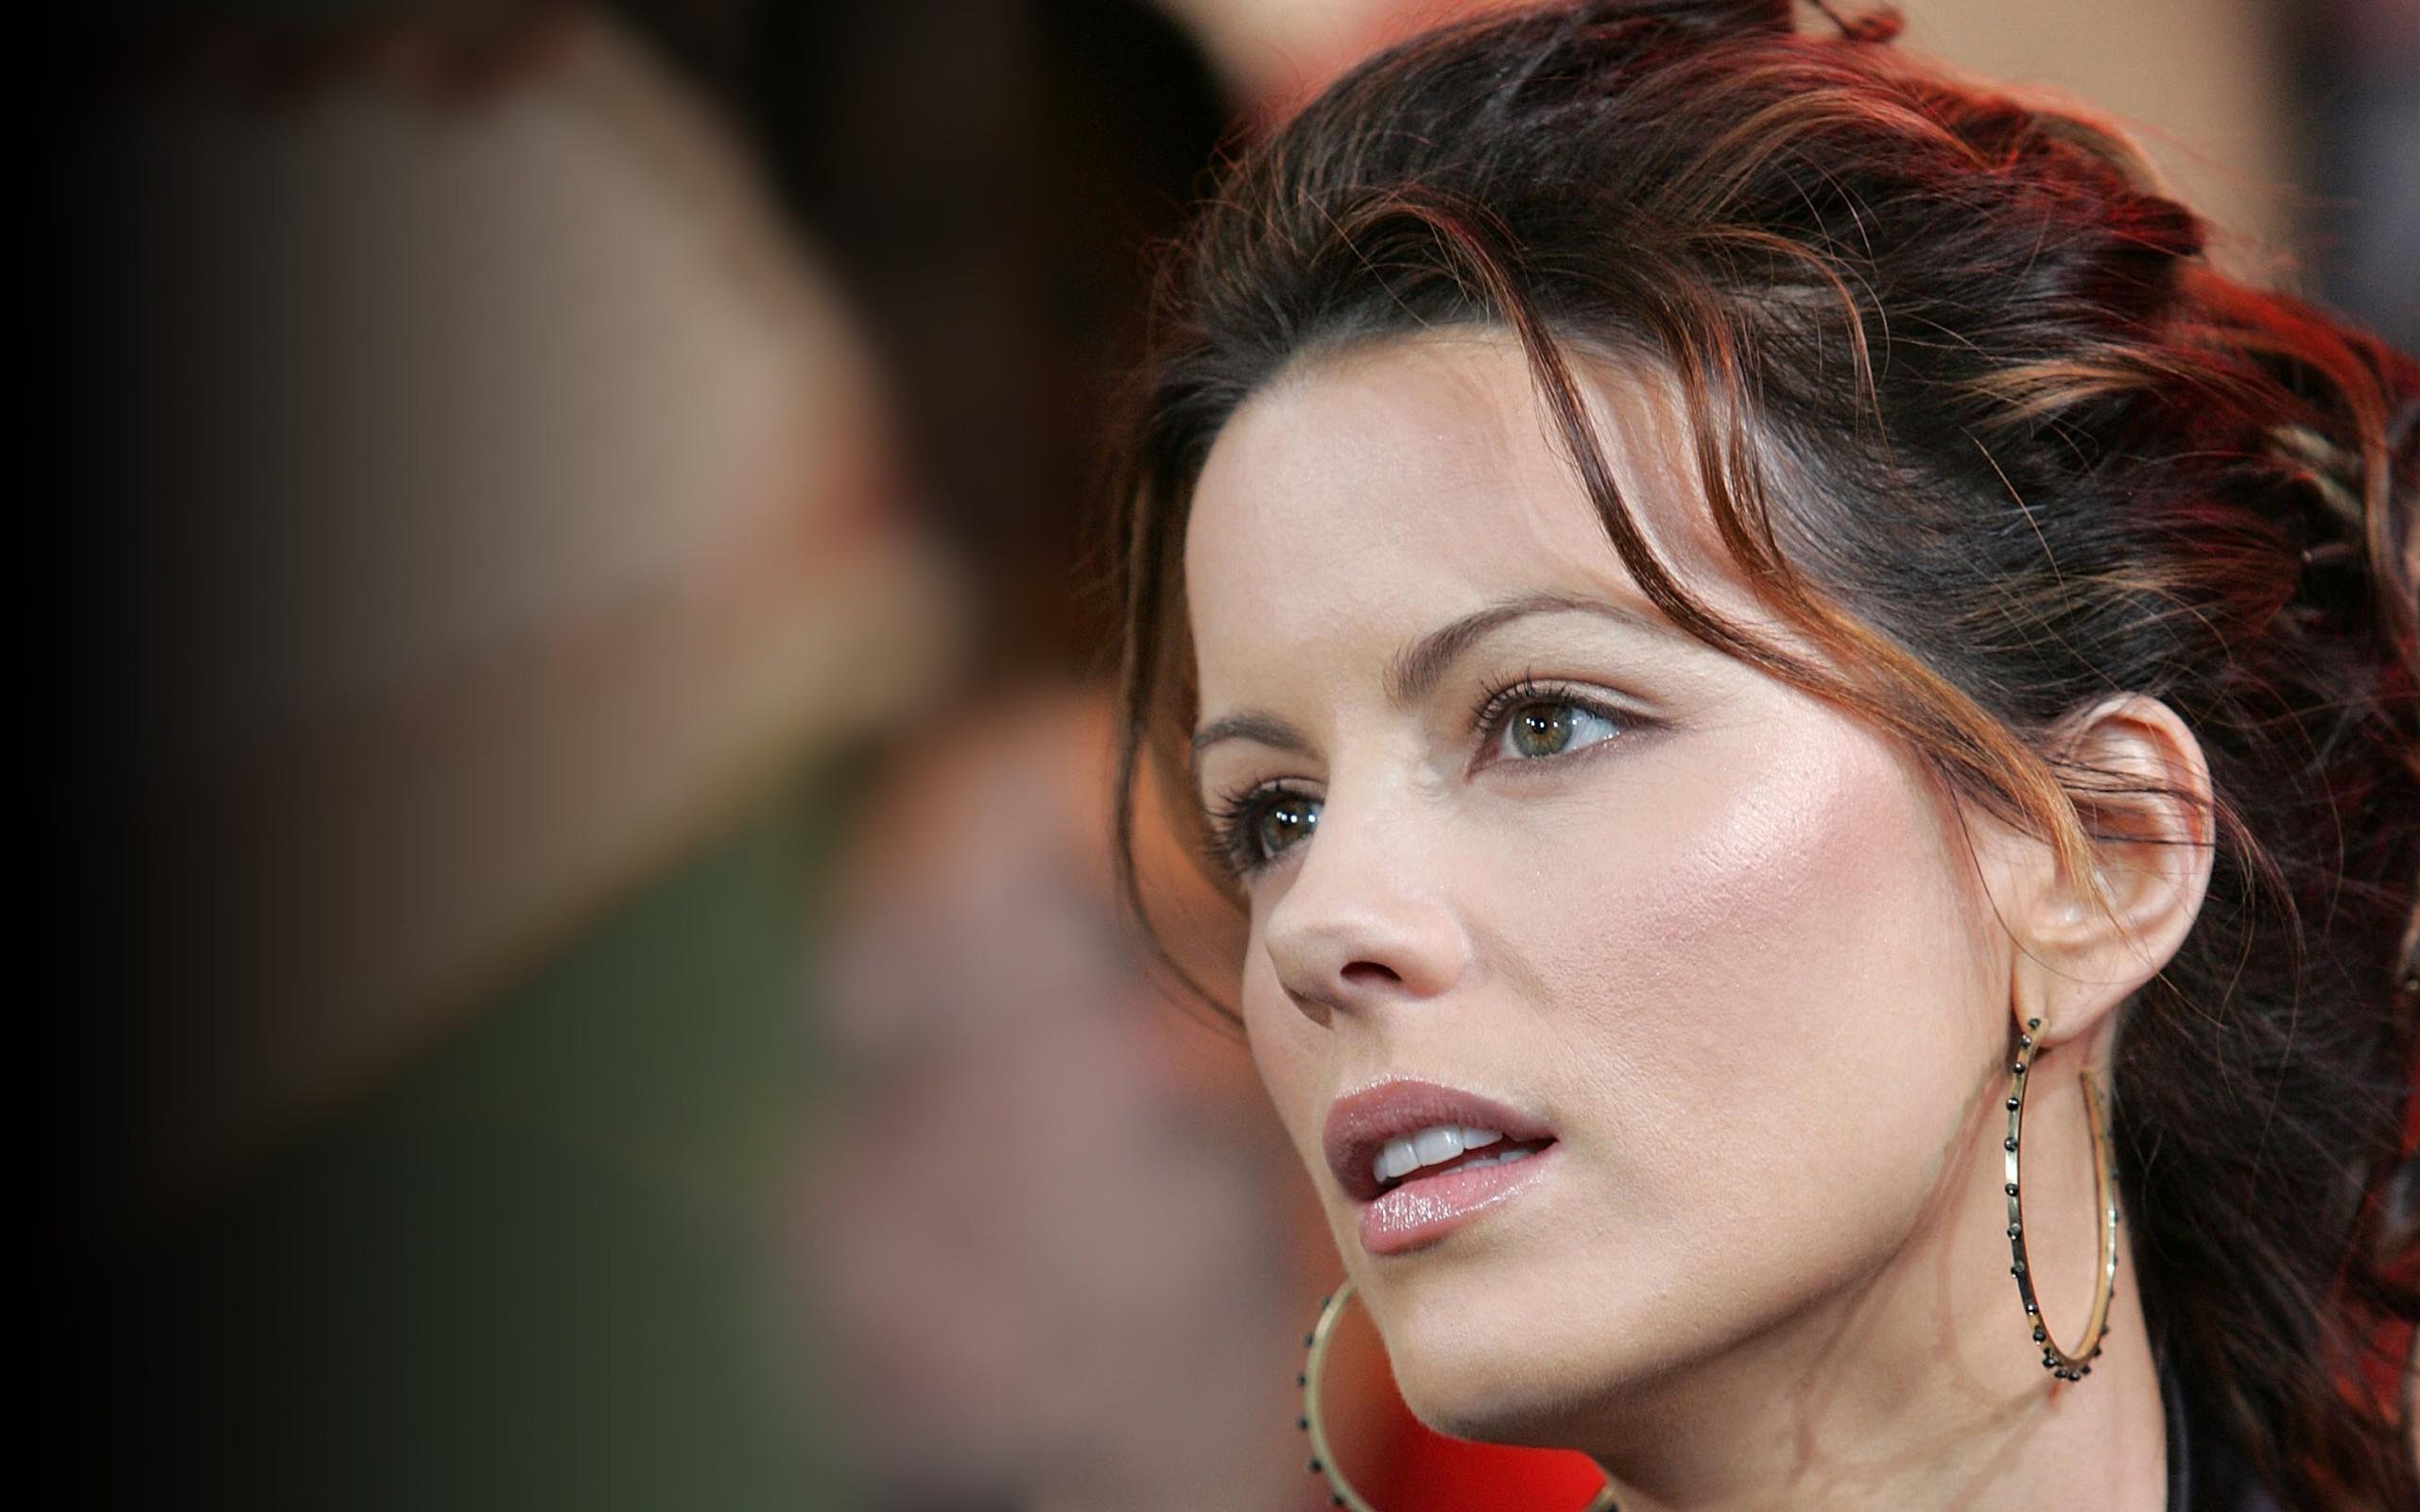 Kate Beckinsale 2013 - 2560x1600